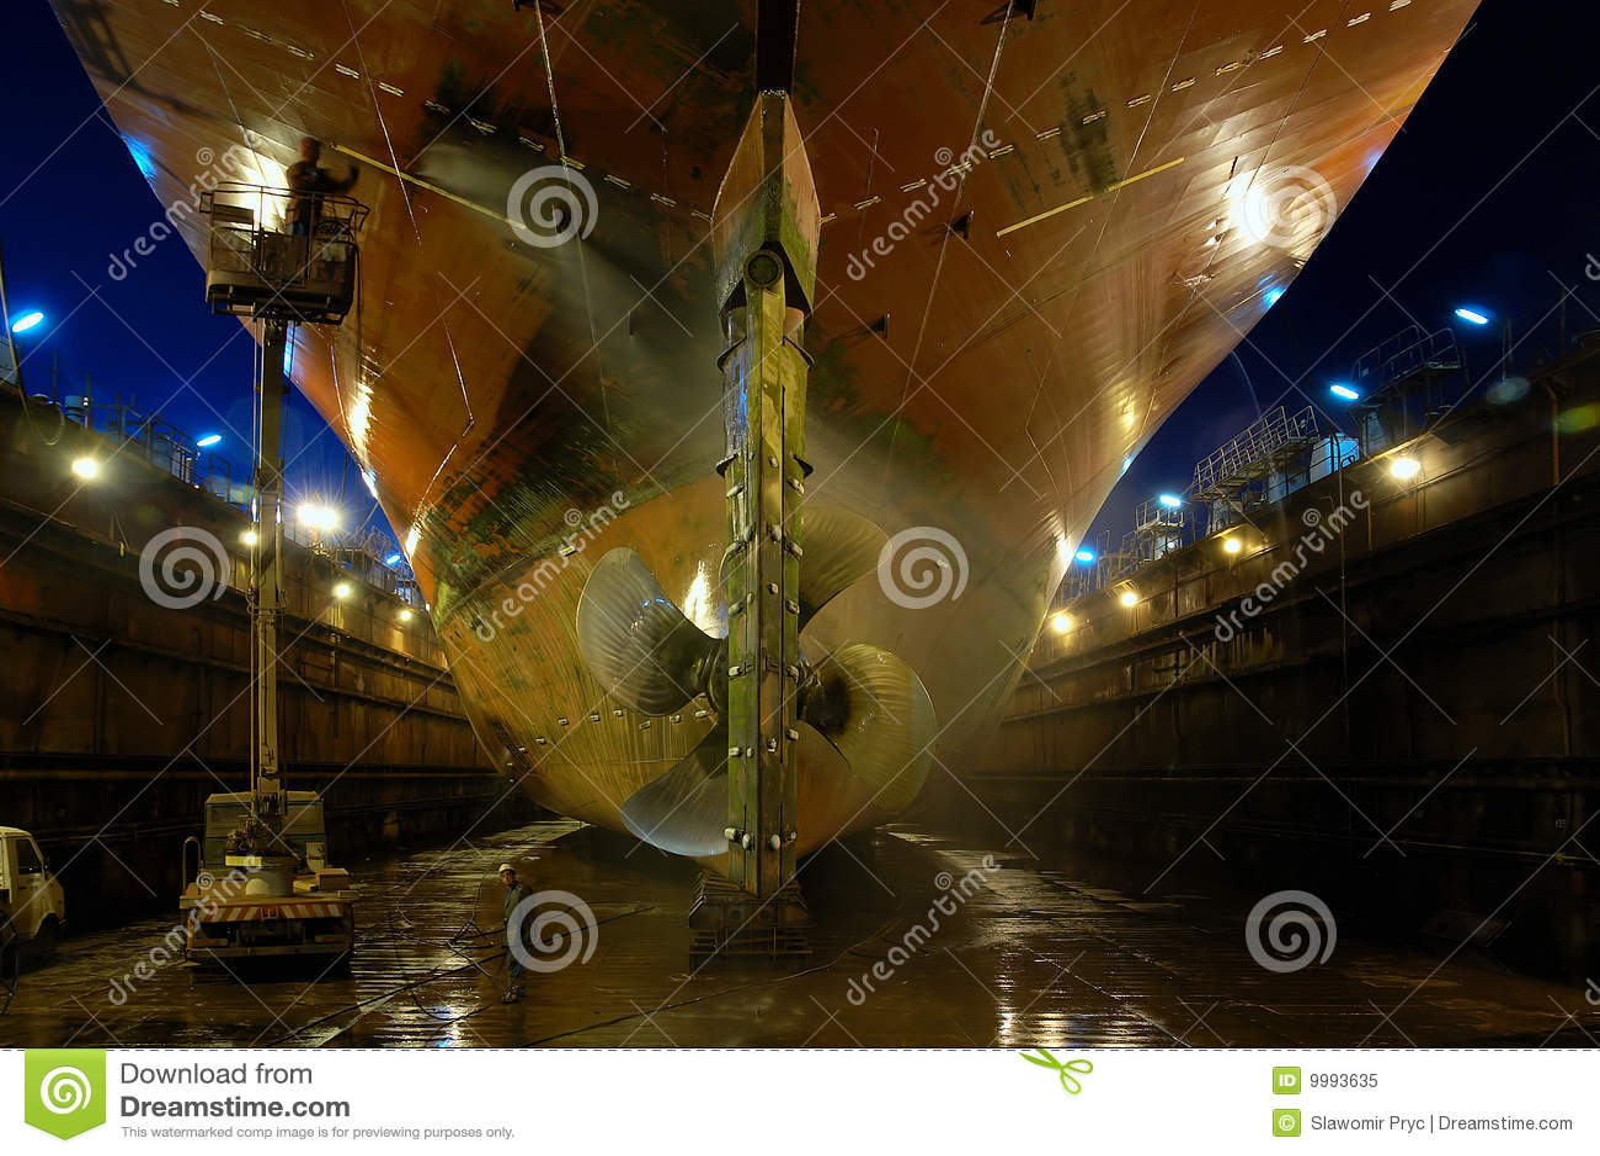 Shipbuilding in a dry dock